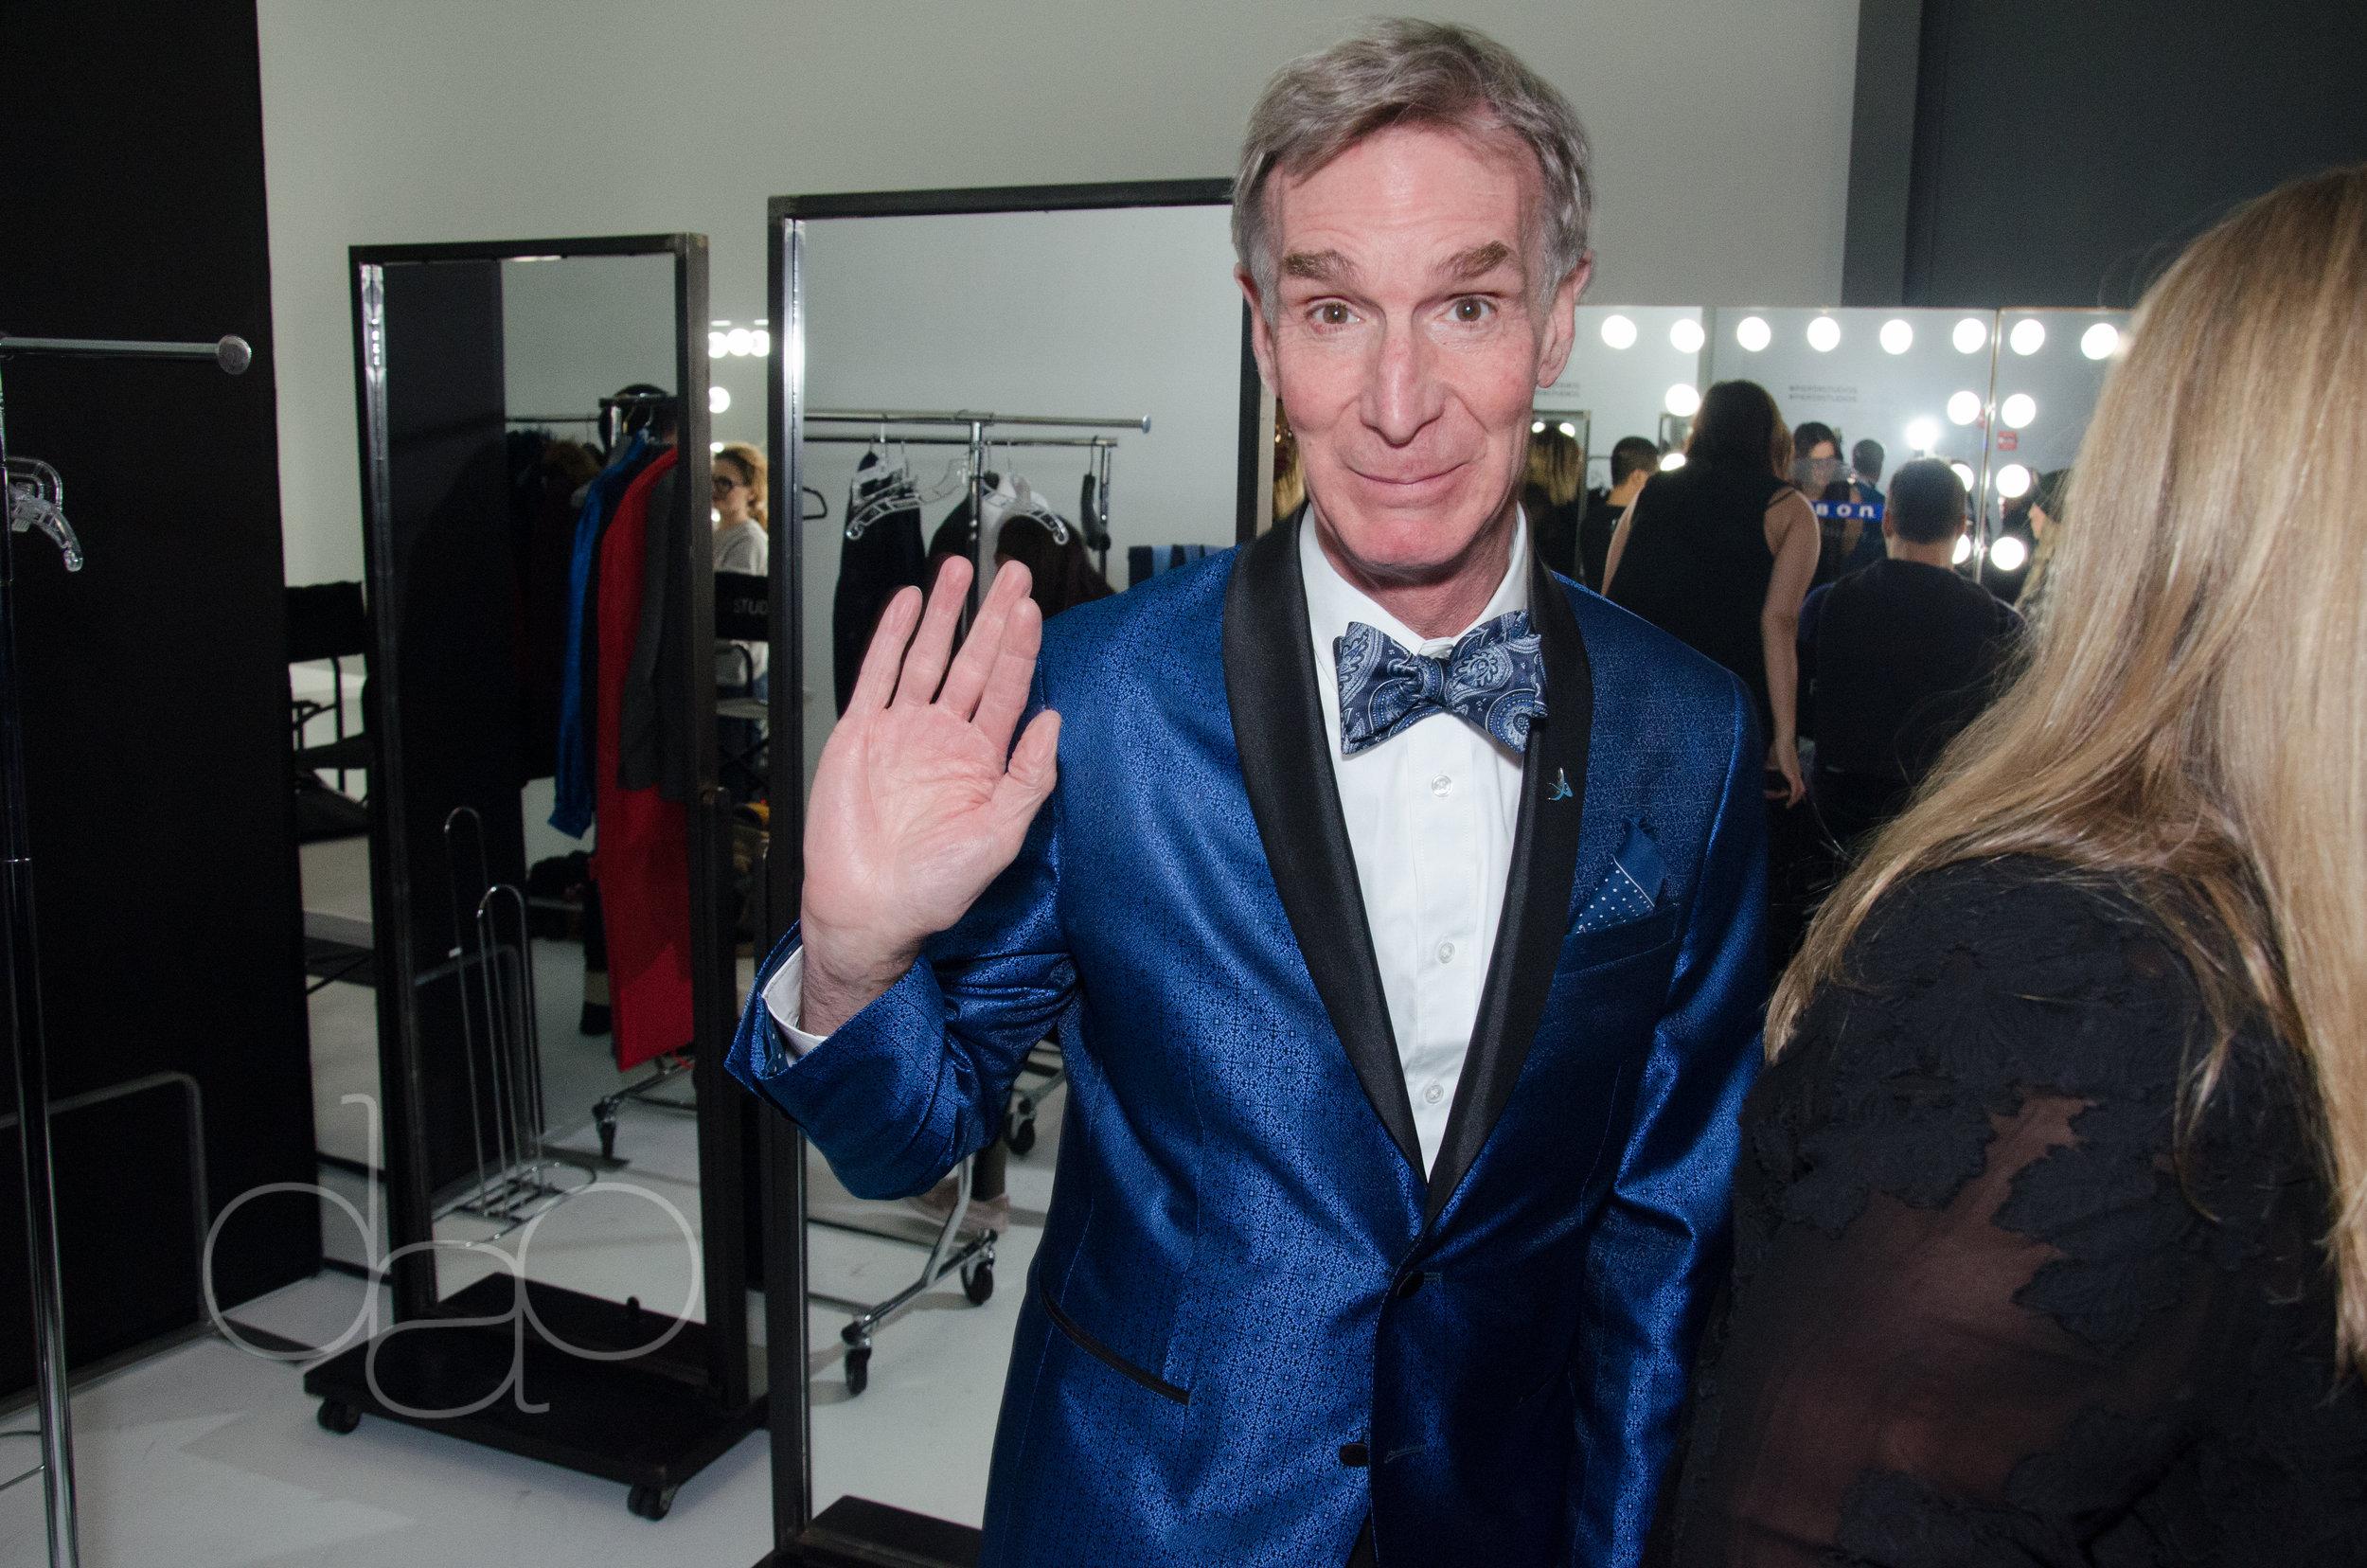 Bill Nye headed to the Catwalk